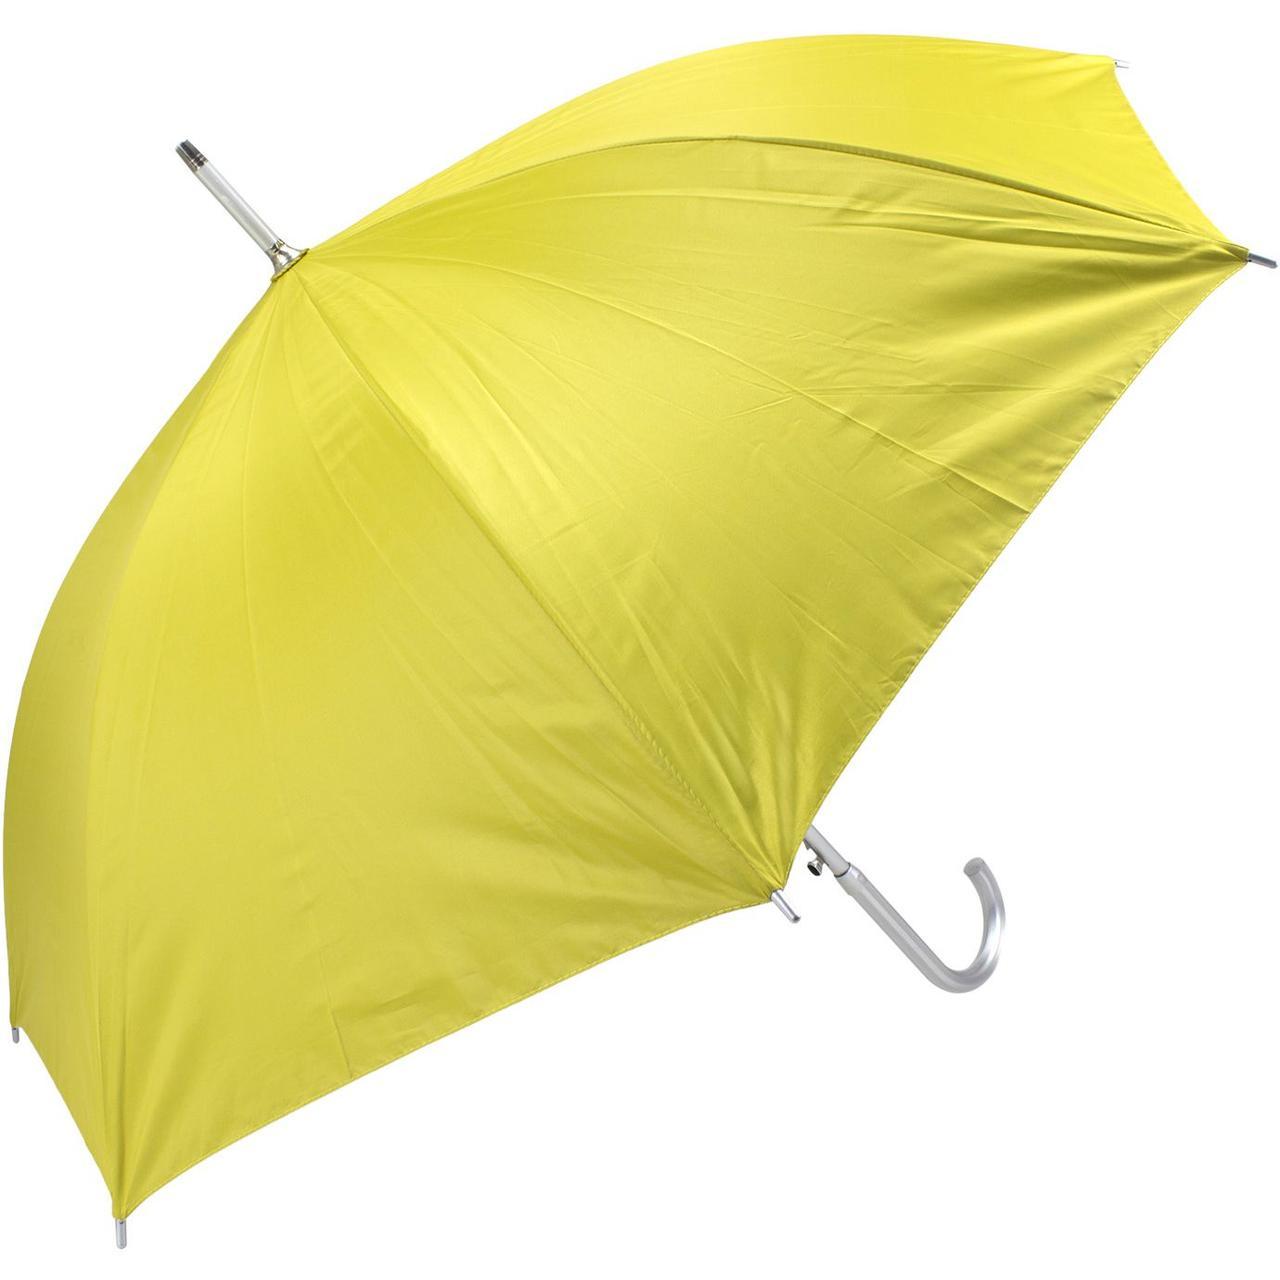 "Парасолька жіноча тростина ""Megan Economix Promo"" жовта E98401-05"